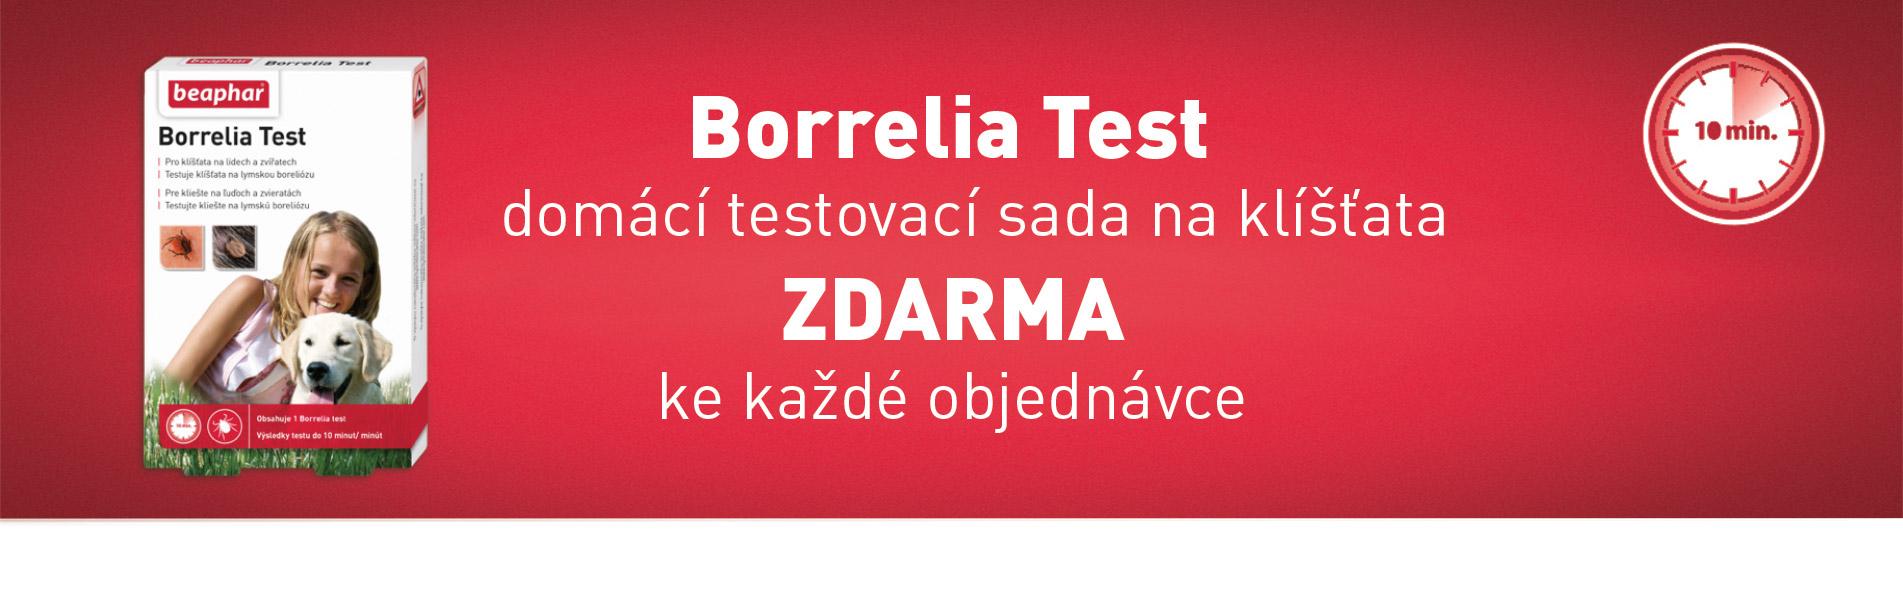 BORRELIA TEST ZDARMA